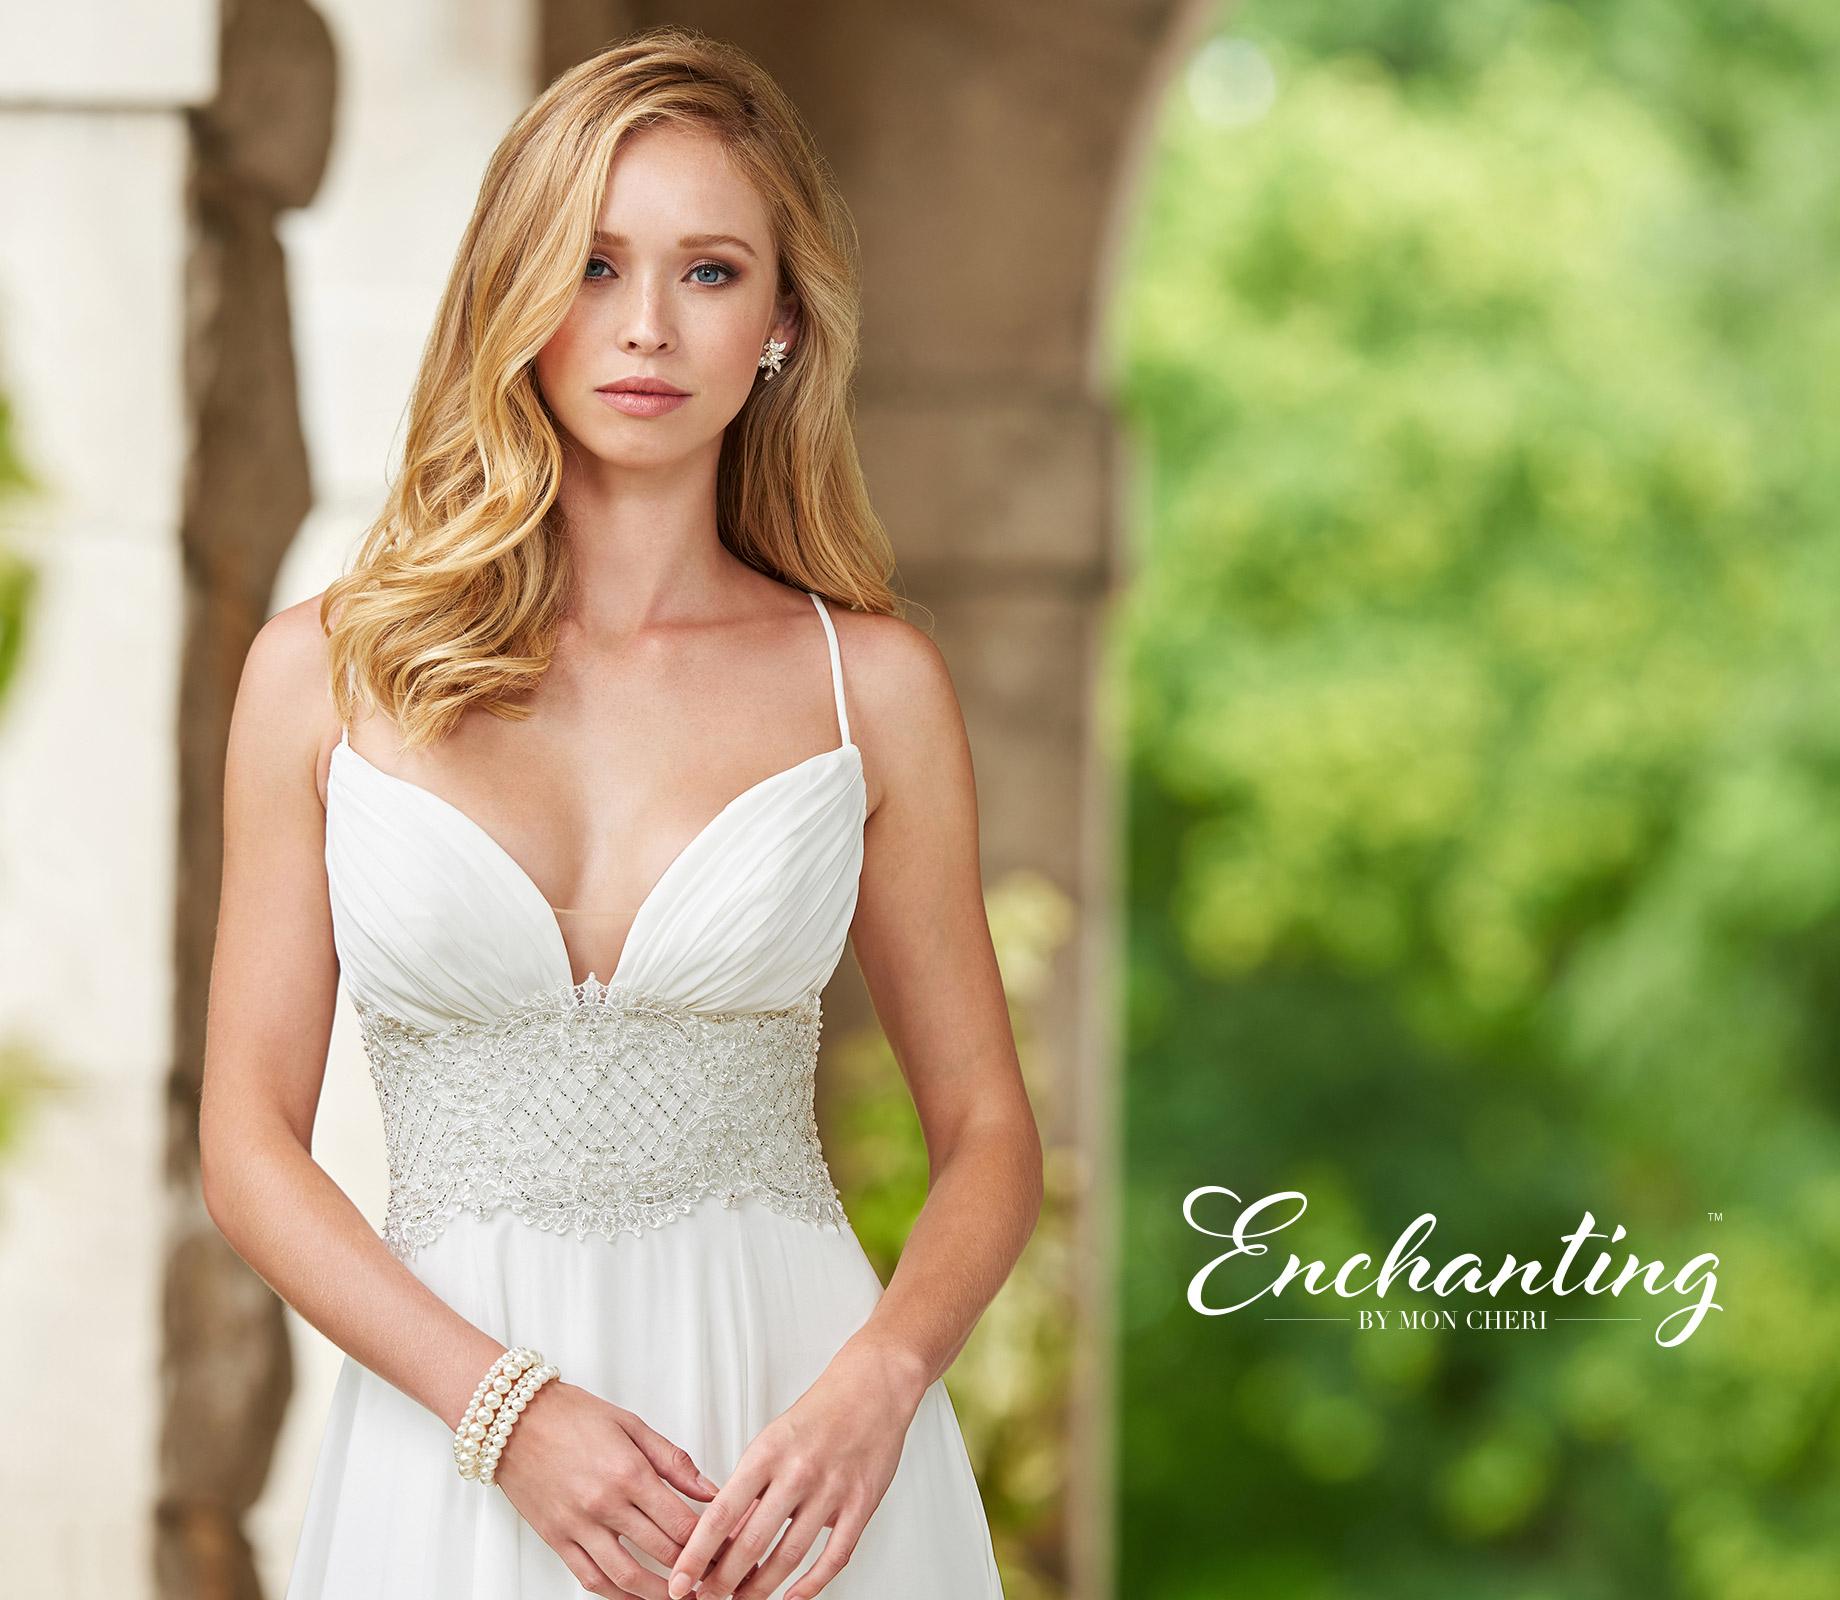 destination-wedding-dress-enchanting-118146_C